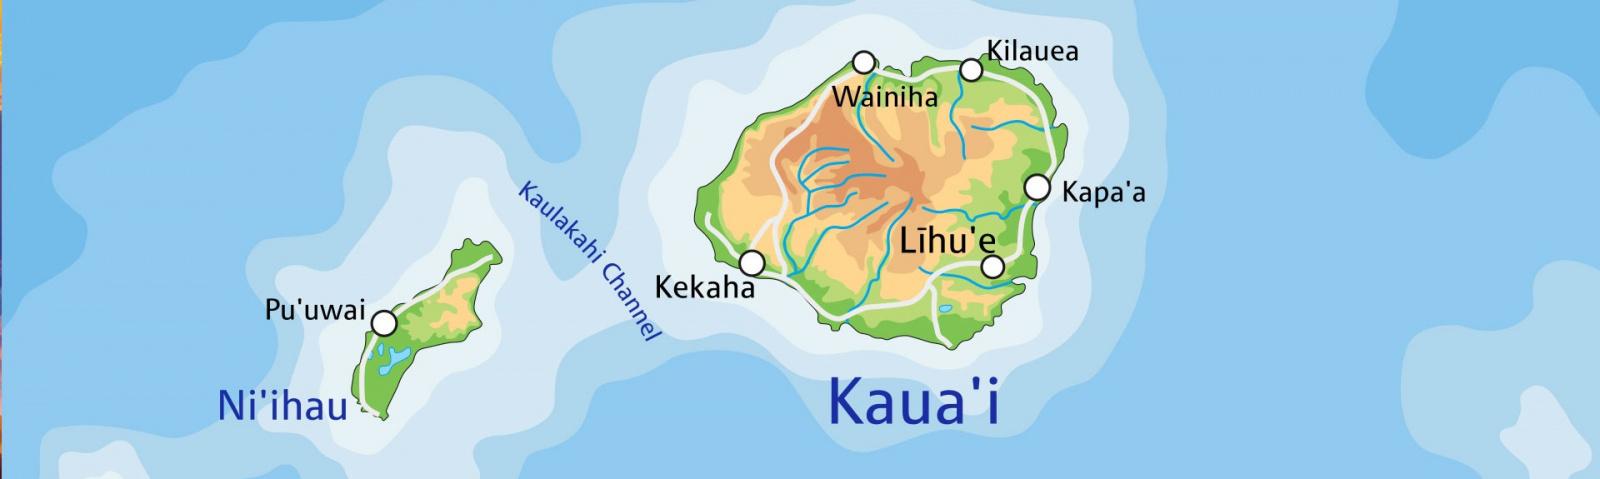 photograph regarding Printable Map of Kauai referred to as Kauai Maps